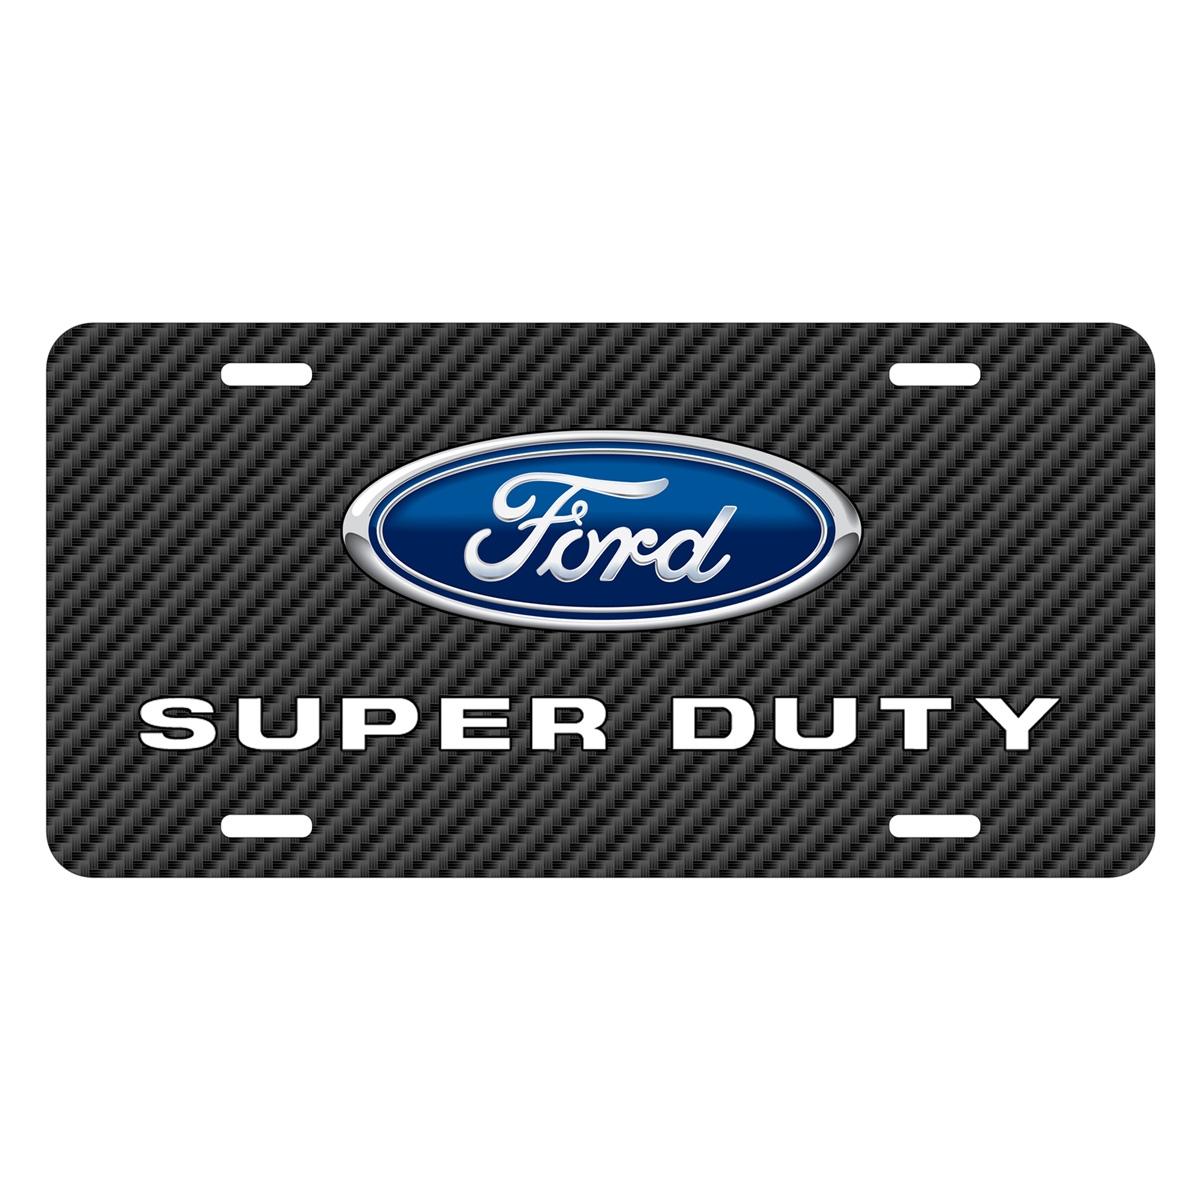 Ford Super-Duty Black Carbon Fiber Texture Graphic UV Metal License Plate